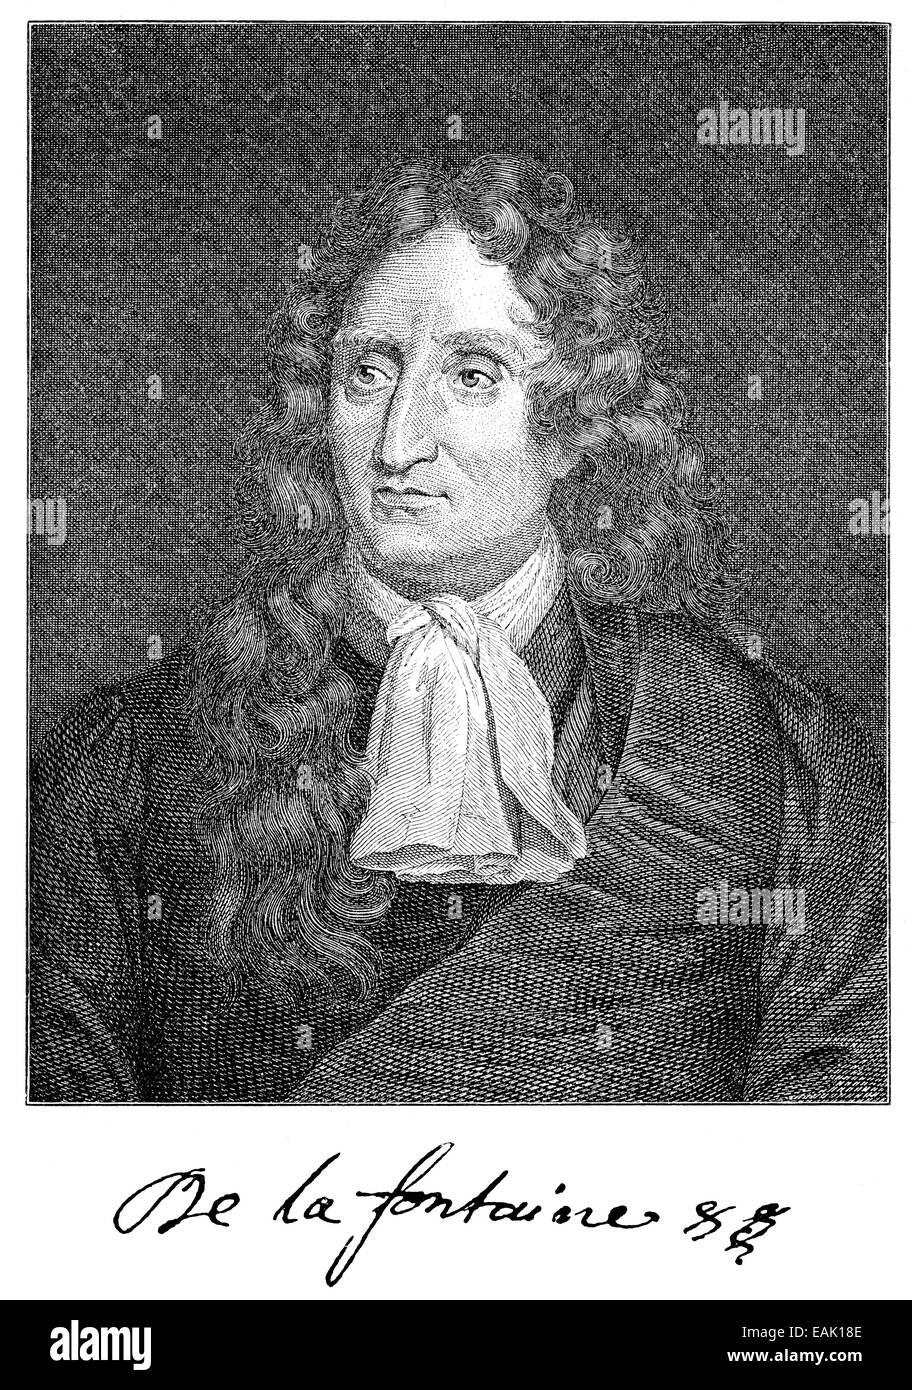 Jean de La Fontaine, 1621 - 1695, a French writer, Portrait von Jean